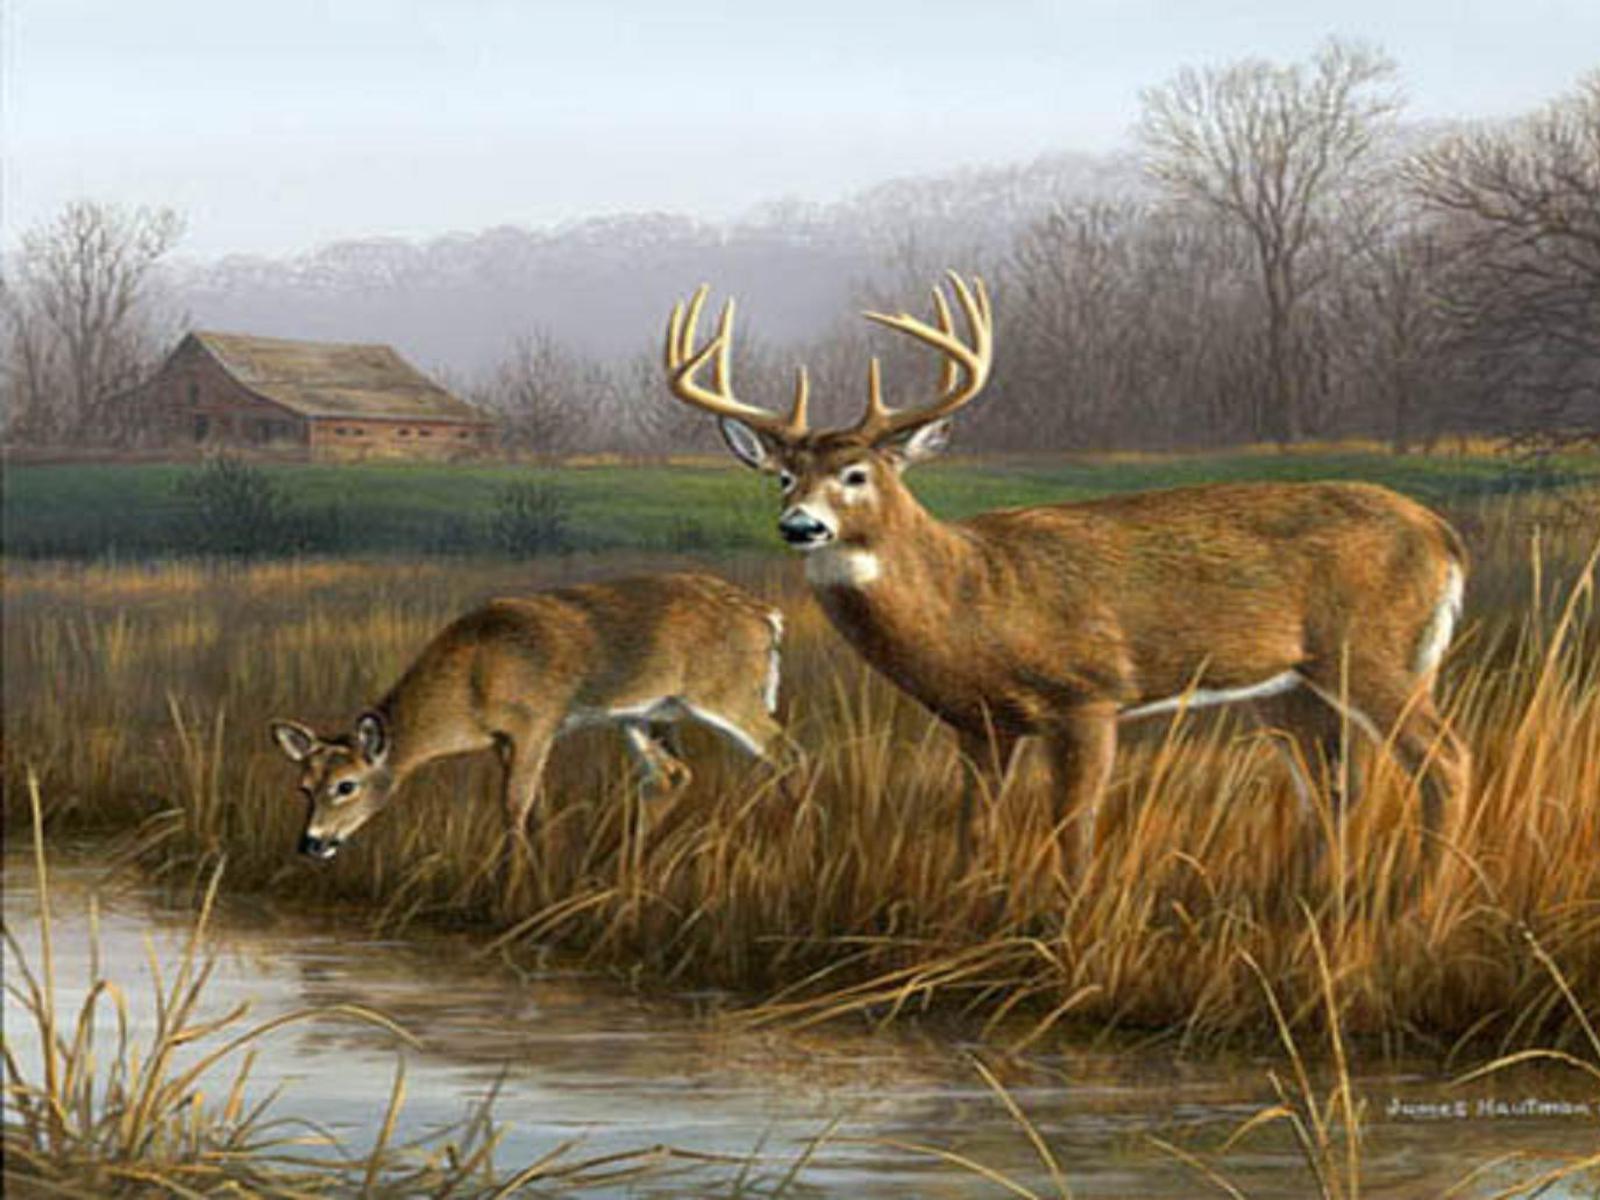 deer hunting games desktop wallpaper download deer hunting games 1600x1200